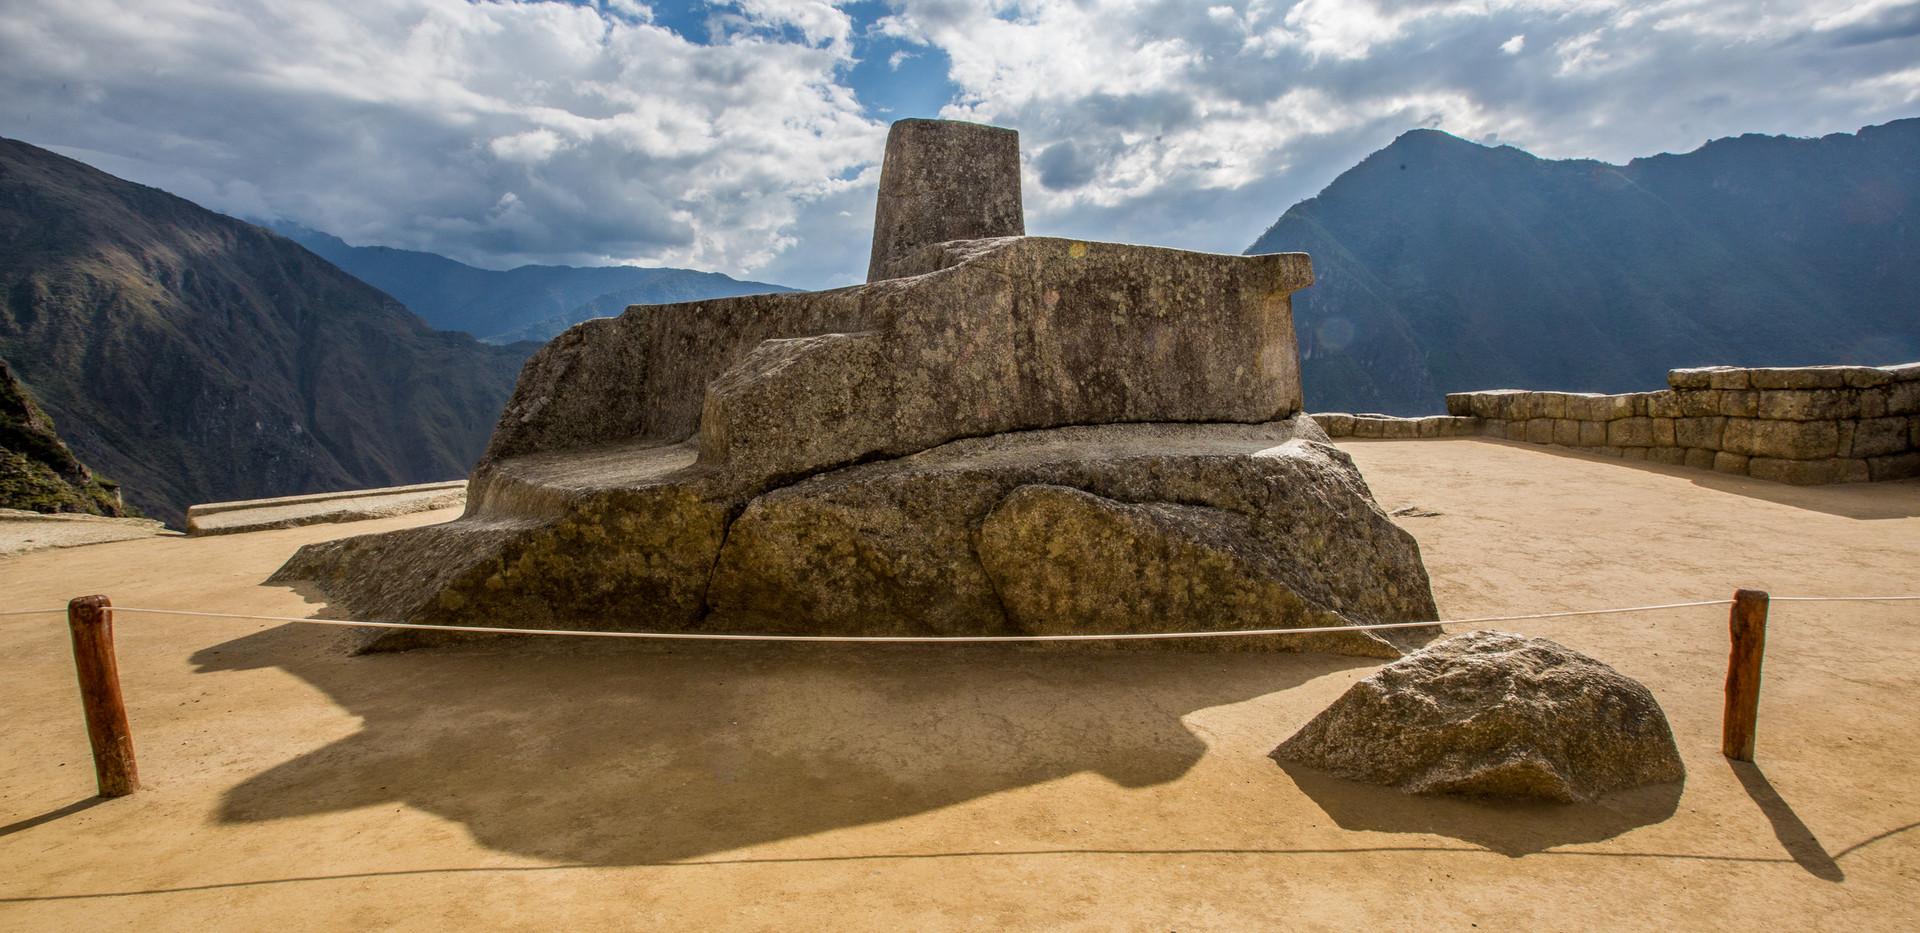 Machu Picchu Citadel (sun dial)